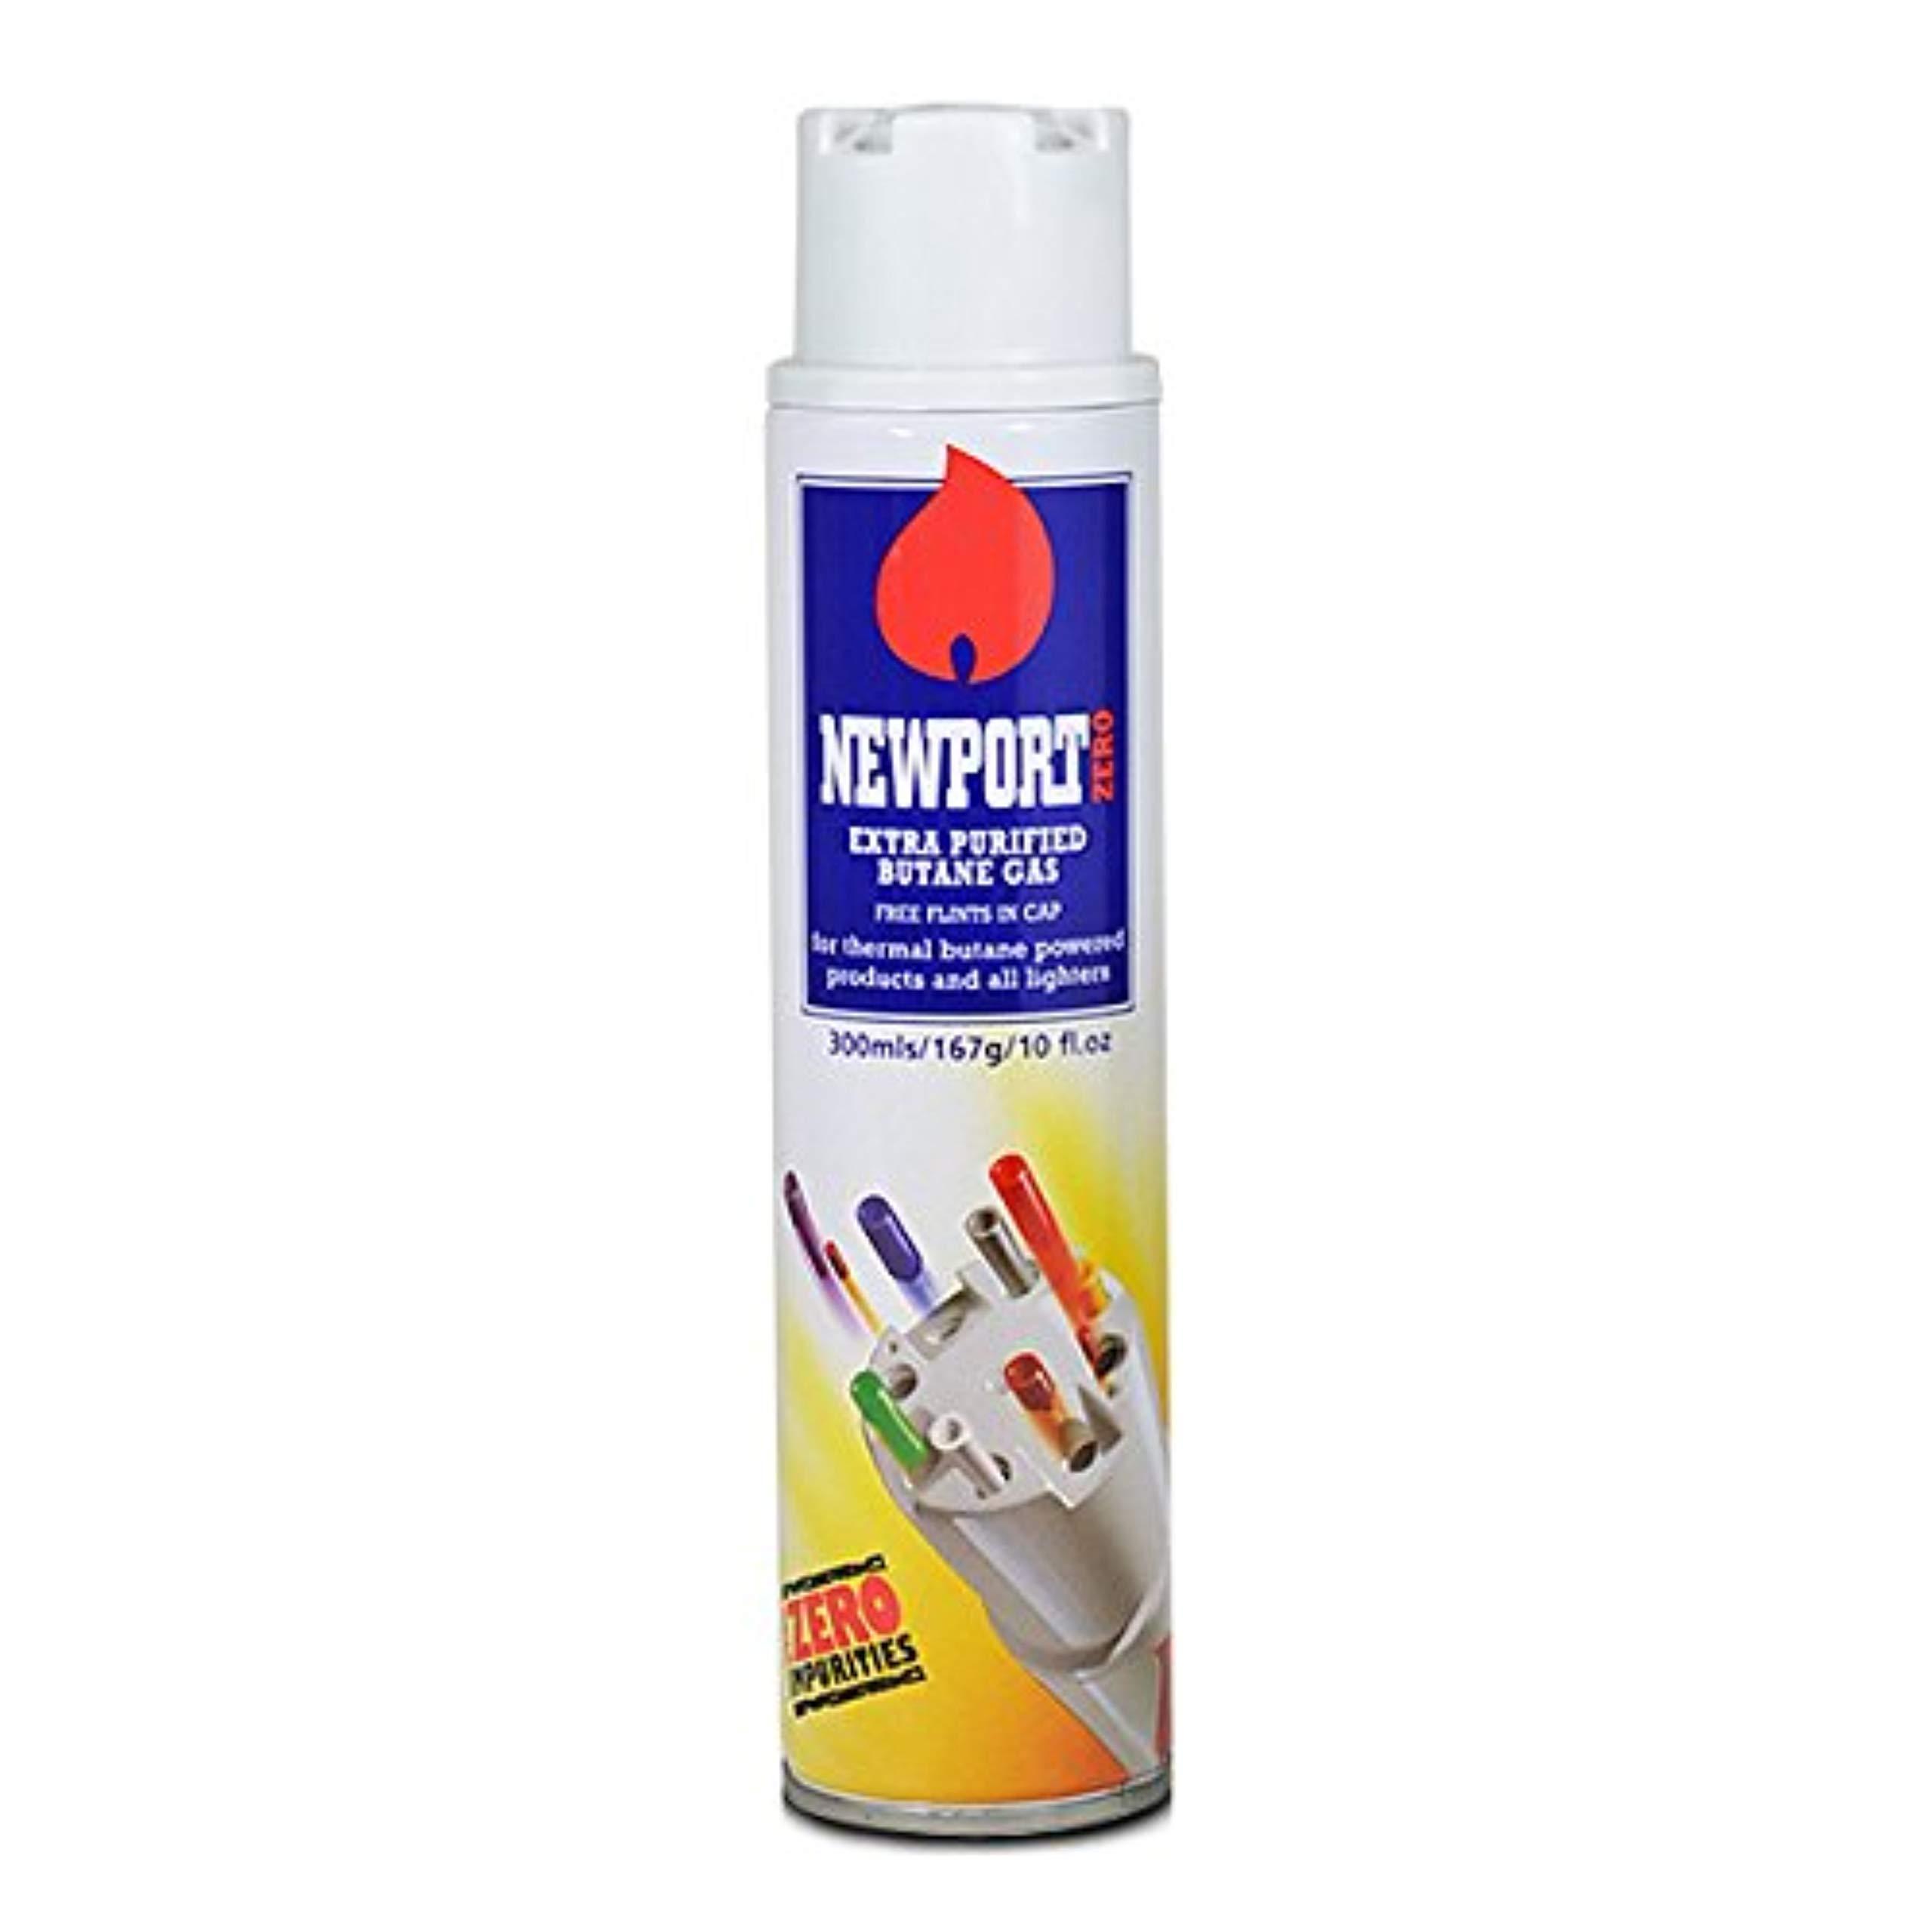 1 can of Newport 300ml Ultra Purified Butane Fuel Zero Impurities